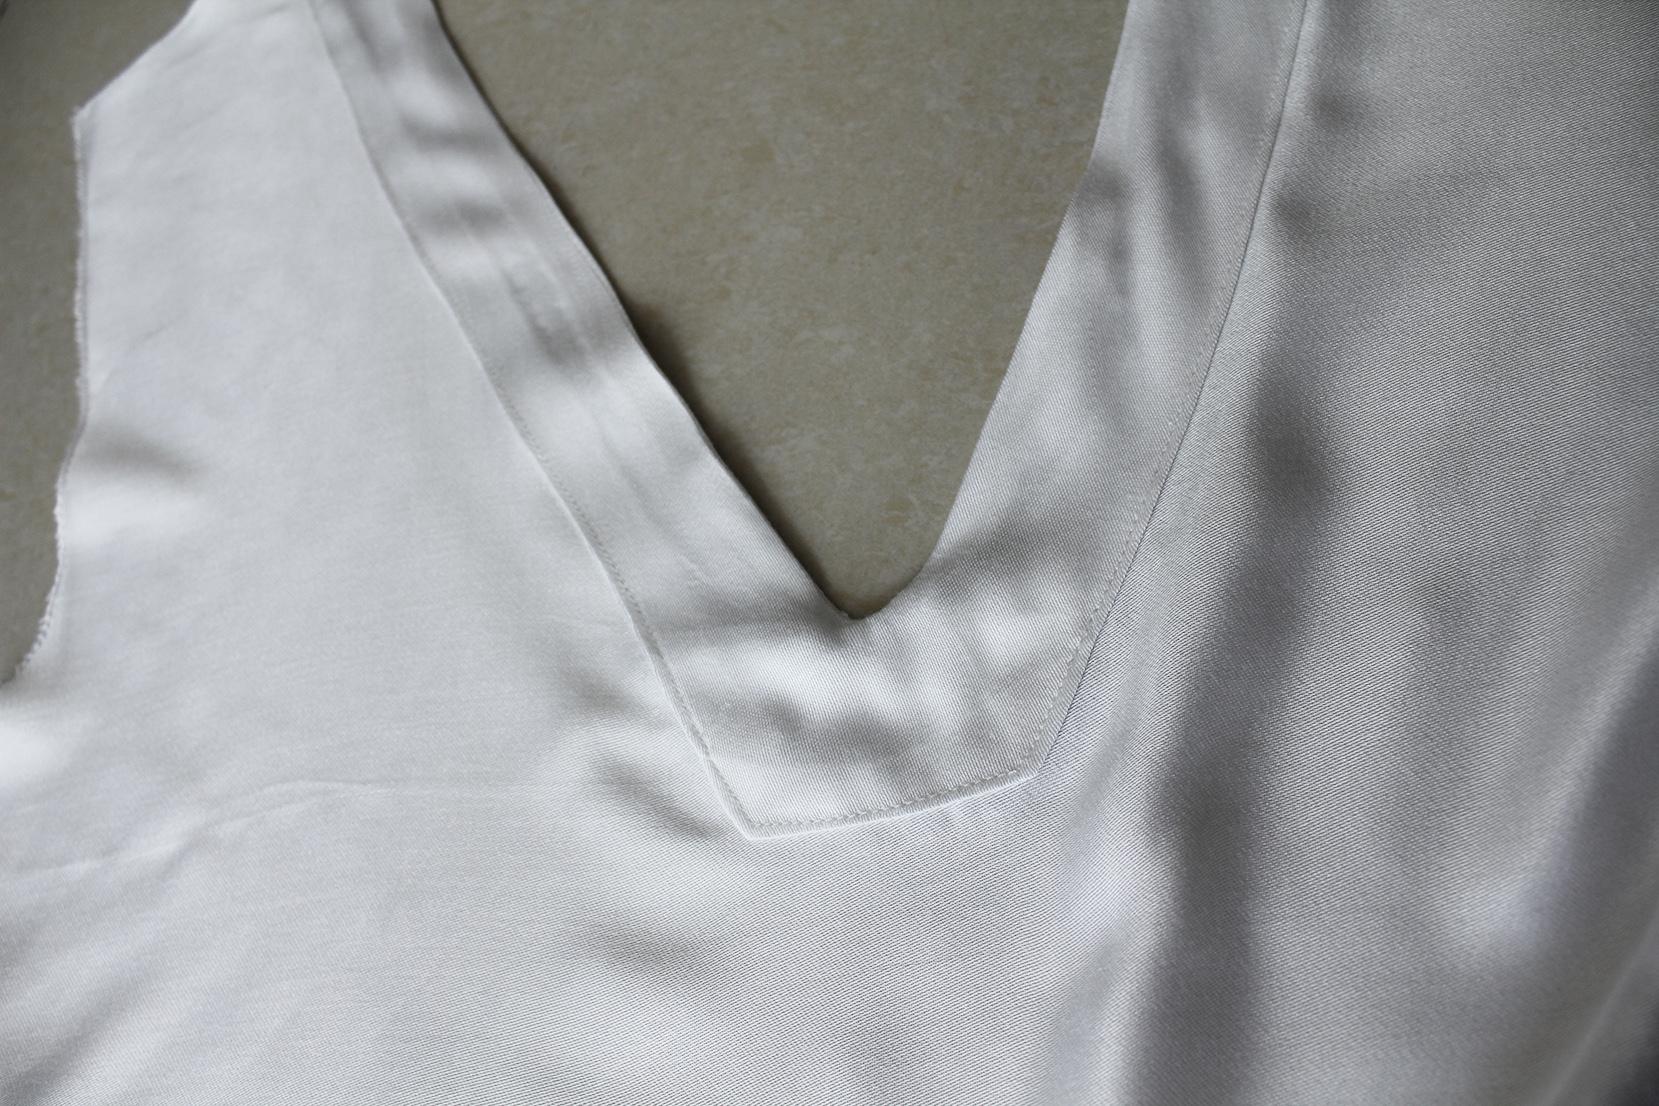 photo 6 Sewn collar.jpg